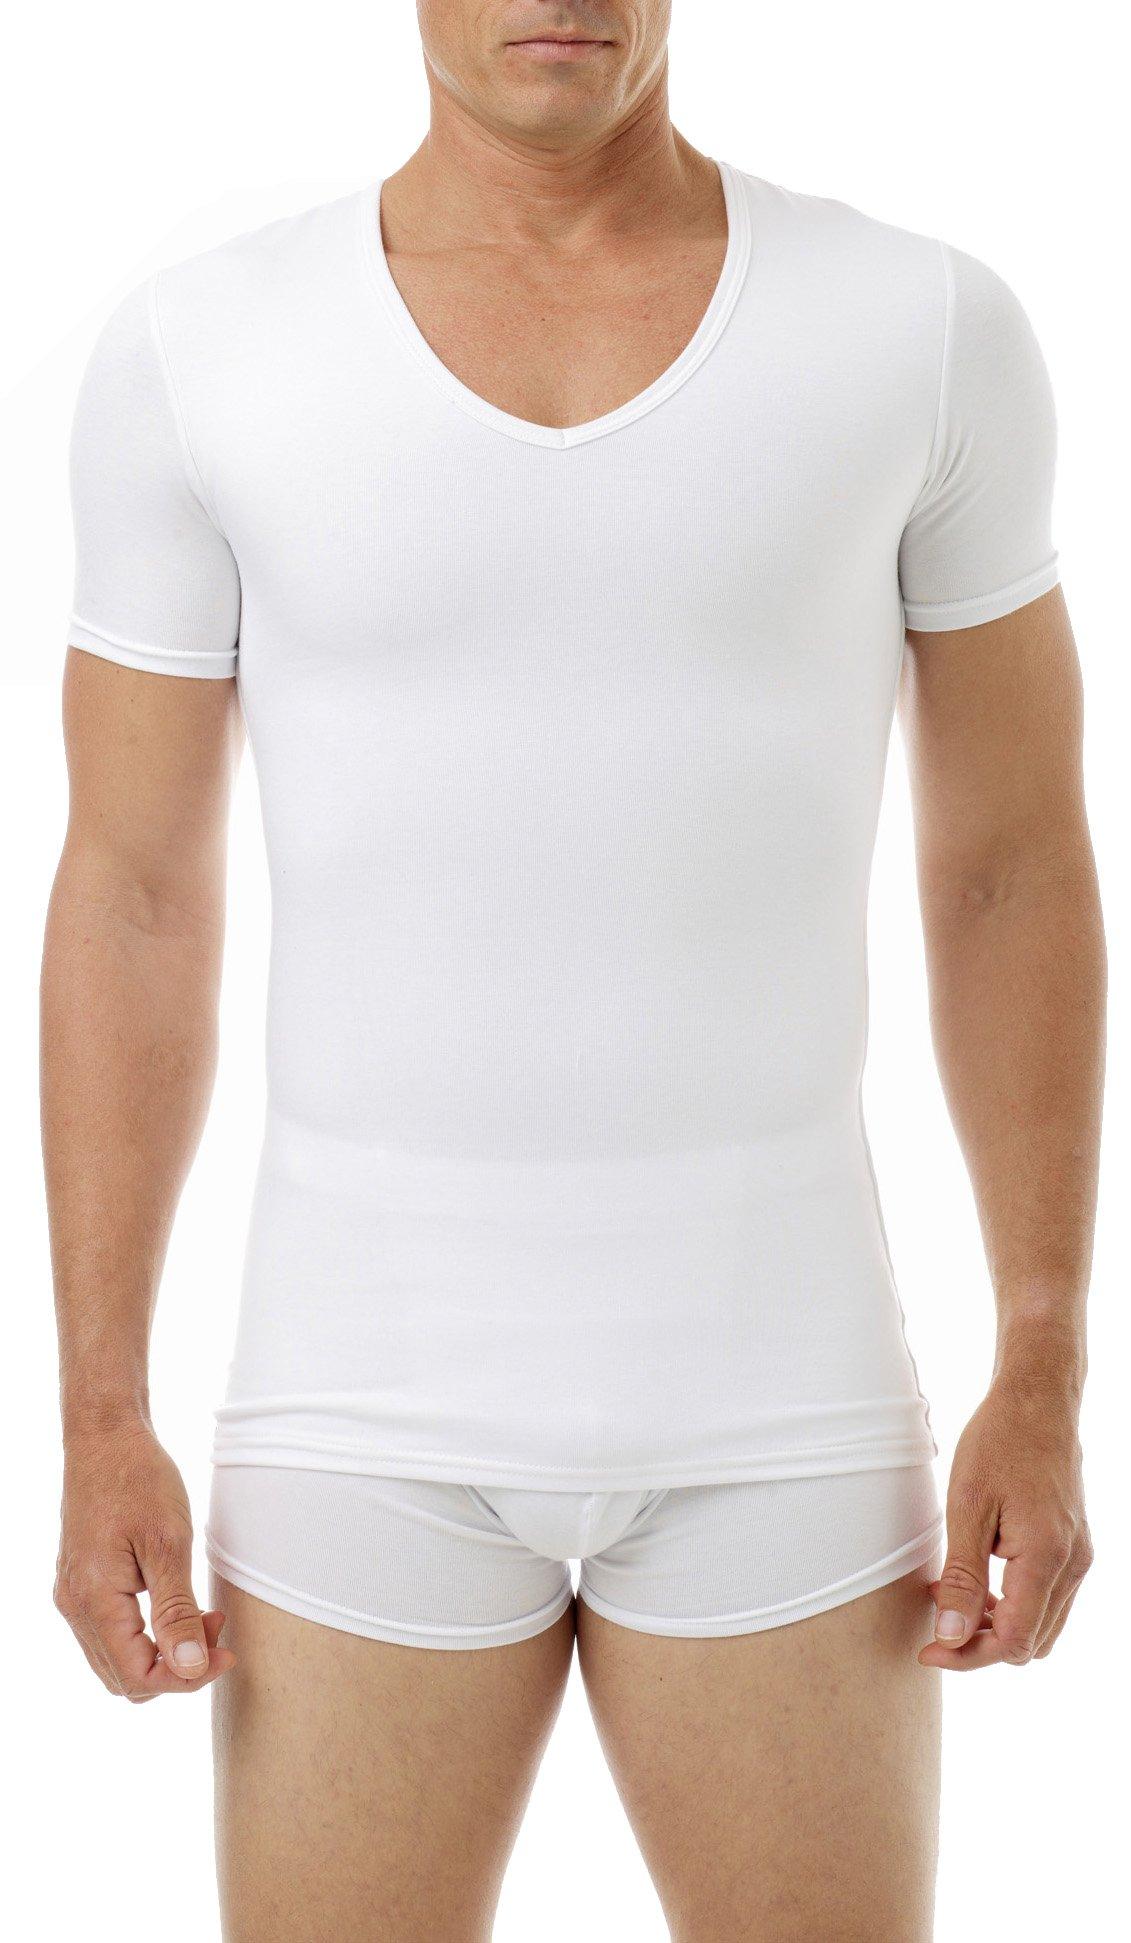 Underworks Cotton Concealer Compression V-neck T-shirt 3-pack Top, 2X, White by Underworks (Image #1)